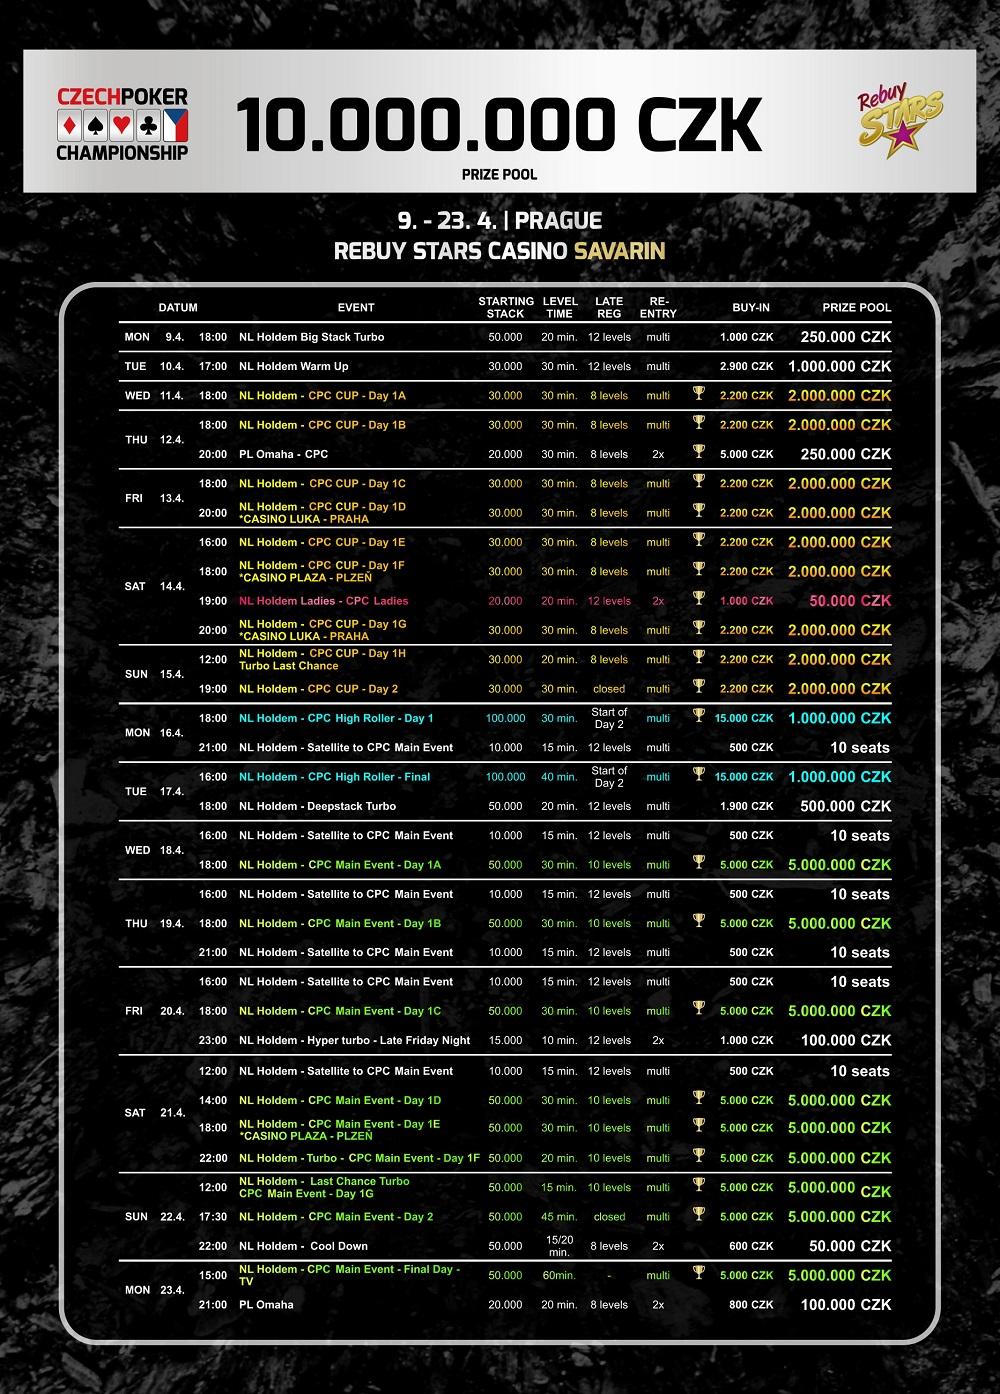 Rozpis MČR turnajů v Rebuy Stars Savarin